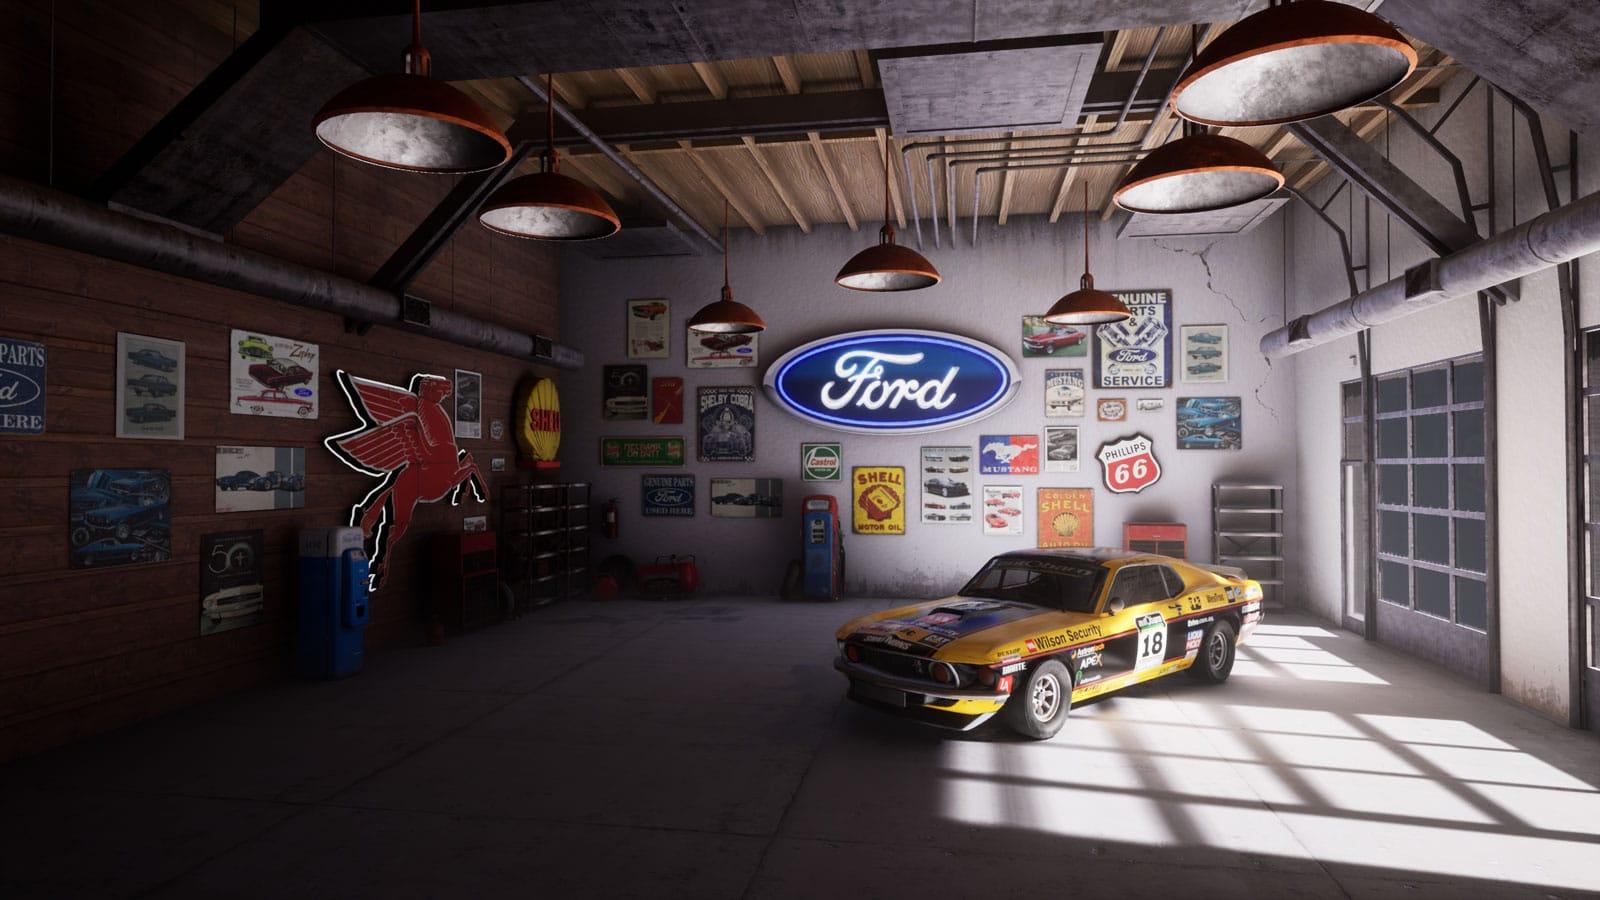 2019 Mustang Unreal Virtual Set Concept Girraphic 9